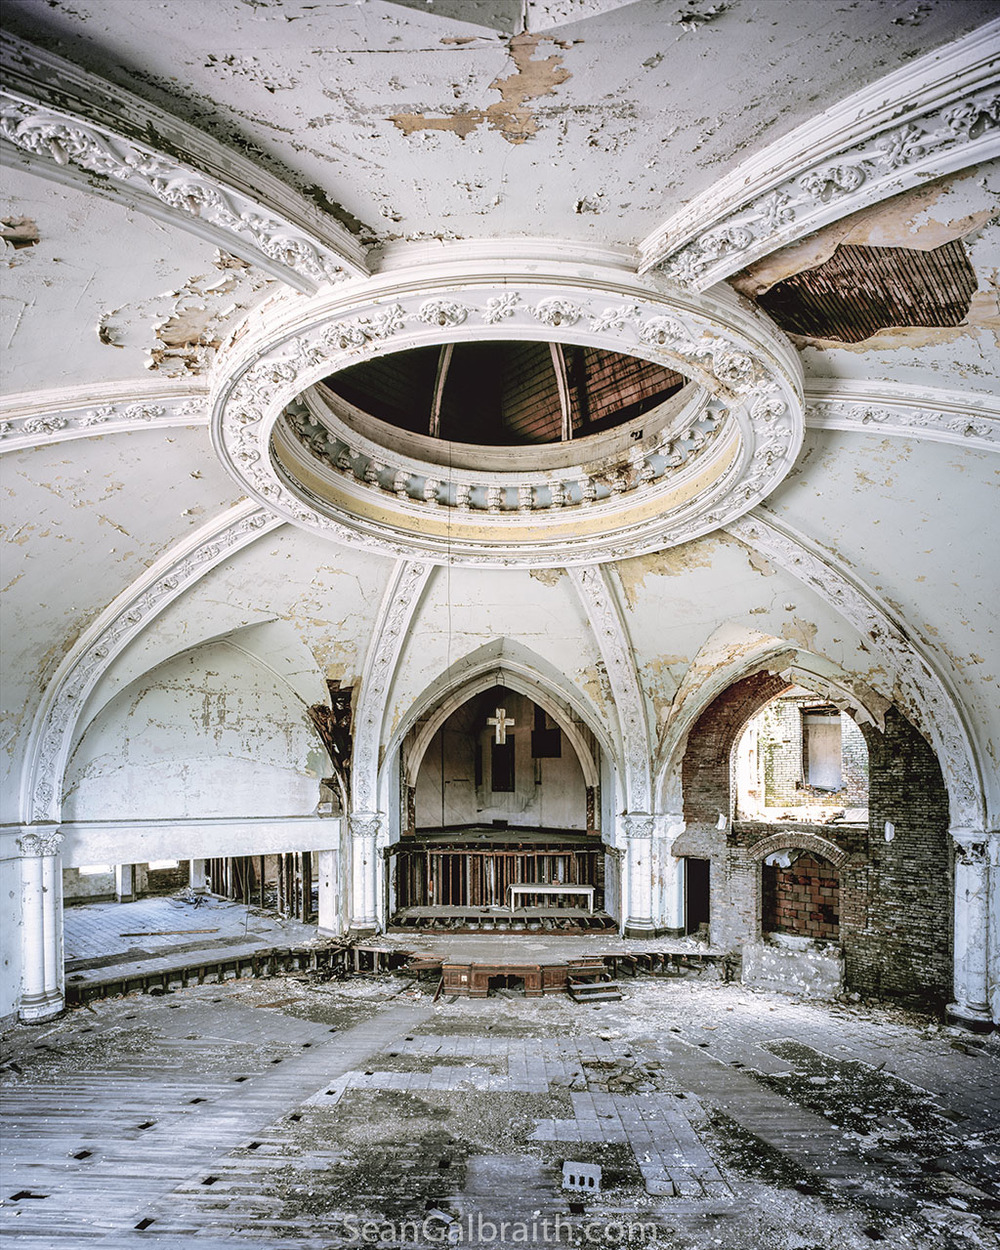 Sean_Galbraith_Photography_White_Room.jpg